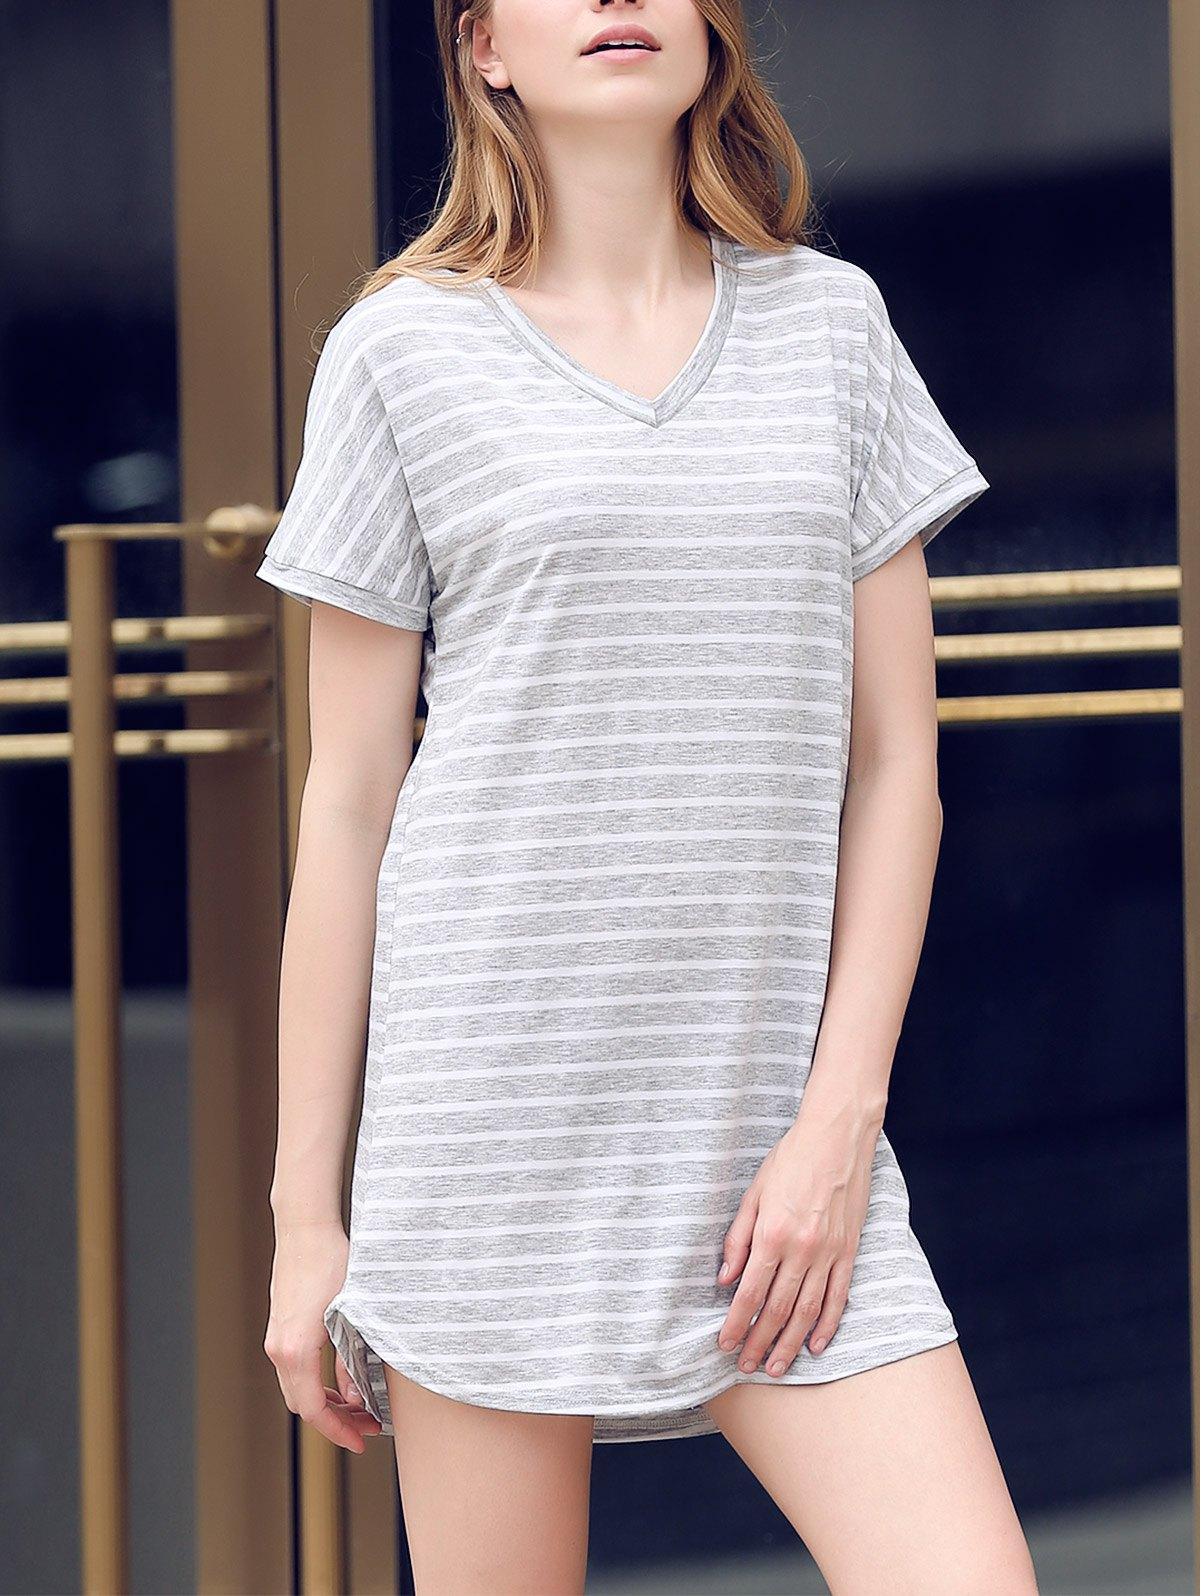 V-Neck Striped Tee DressClothes<br><br><br>Size: XL<br>Color: GRAY